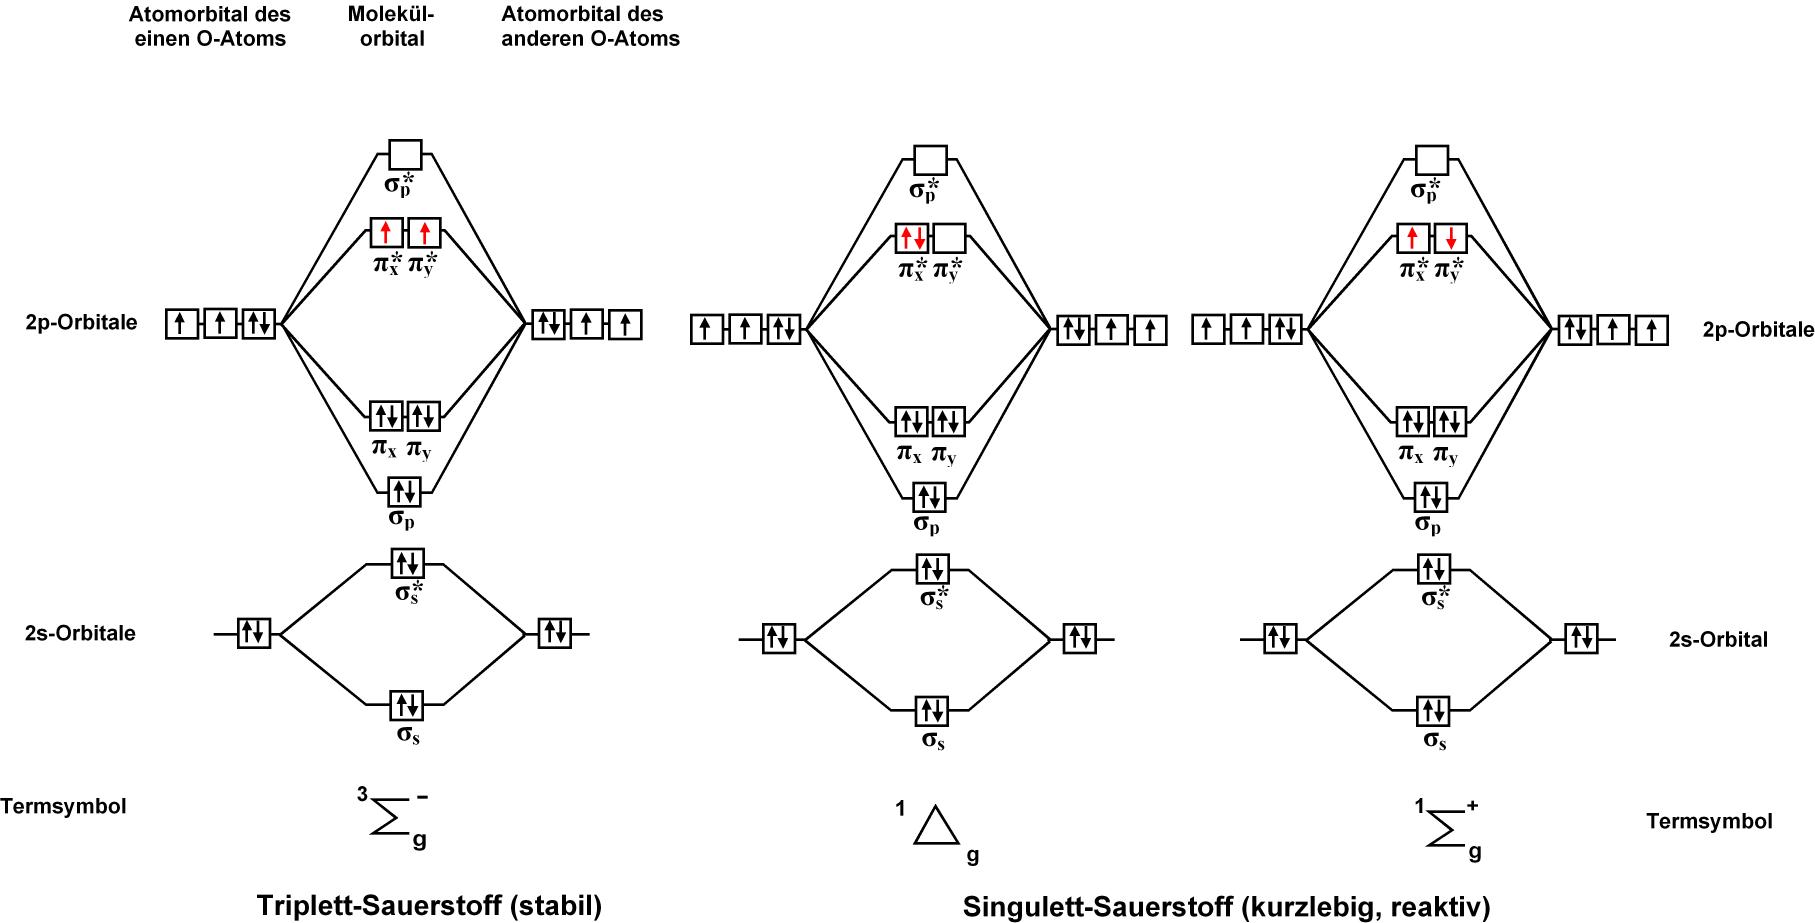 Plikmolekülorbital Sauerstoffpng Wikipedia Wolna Encyklopedia